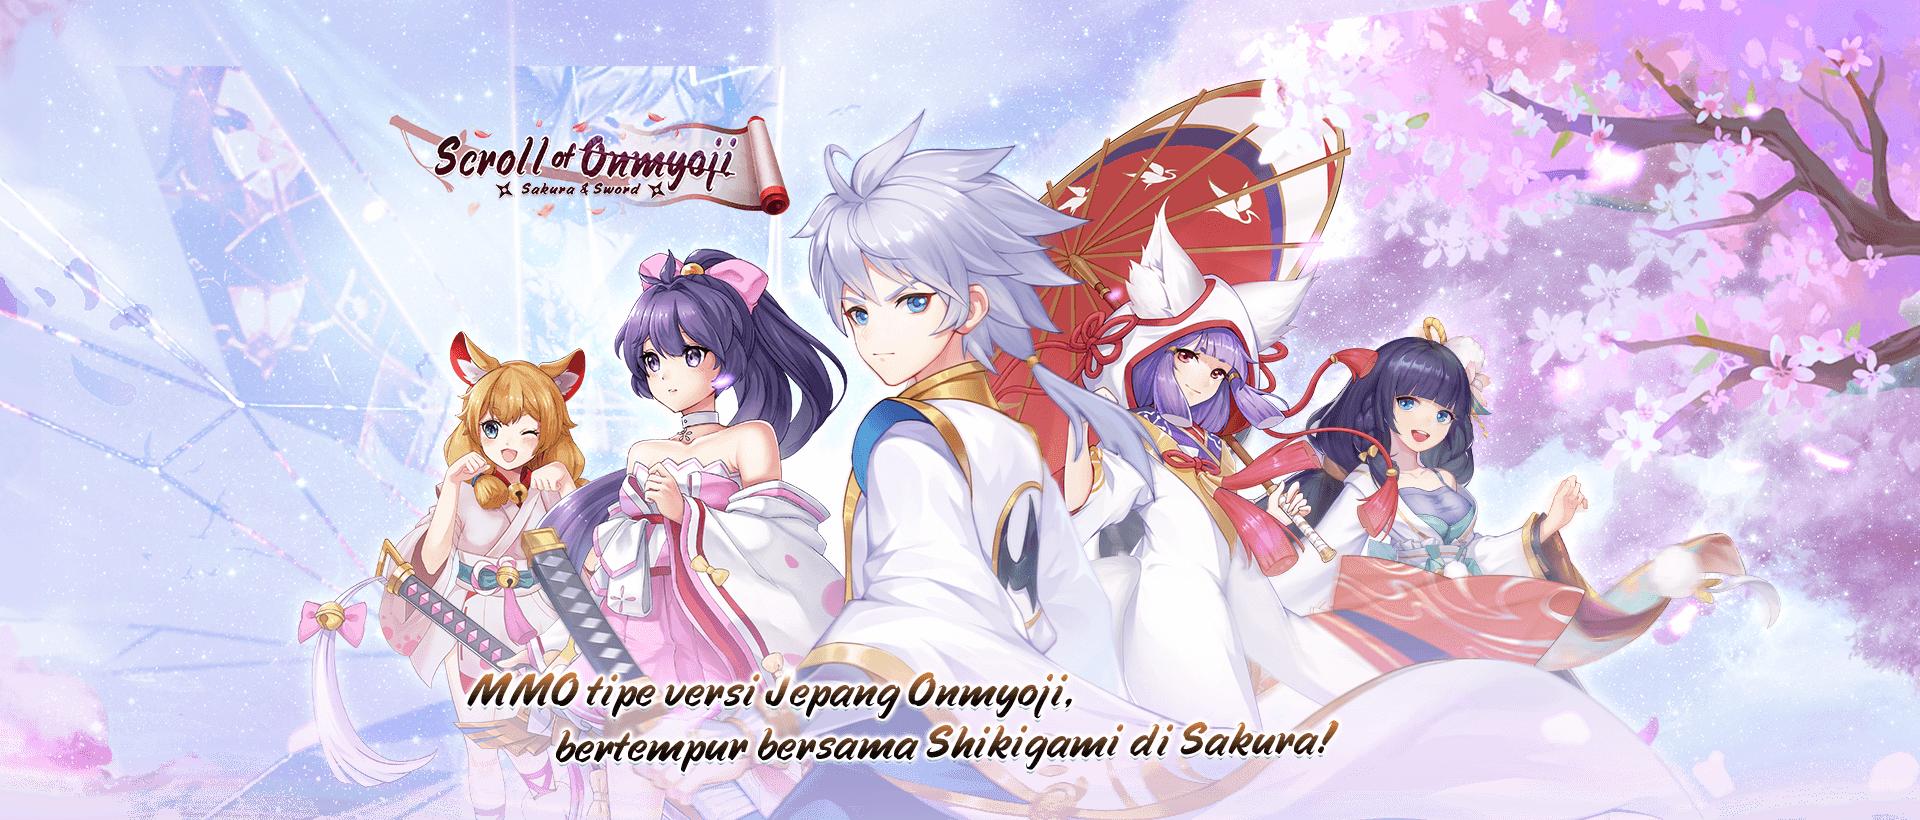 Scroll of Onmyoji: Sakura & Sword